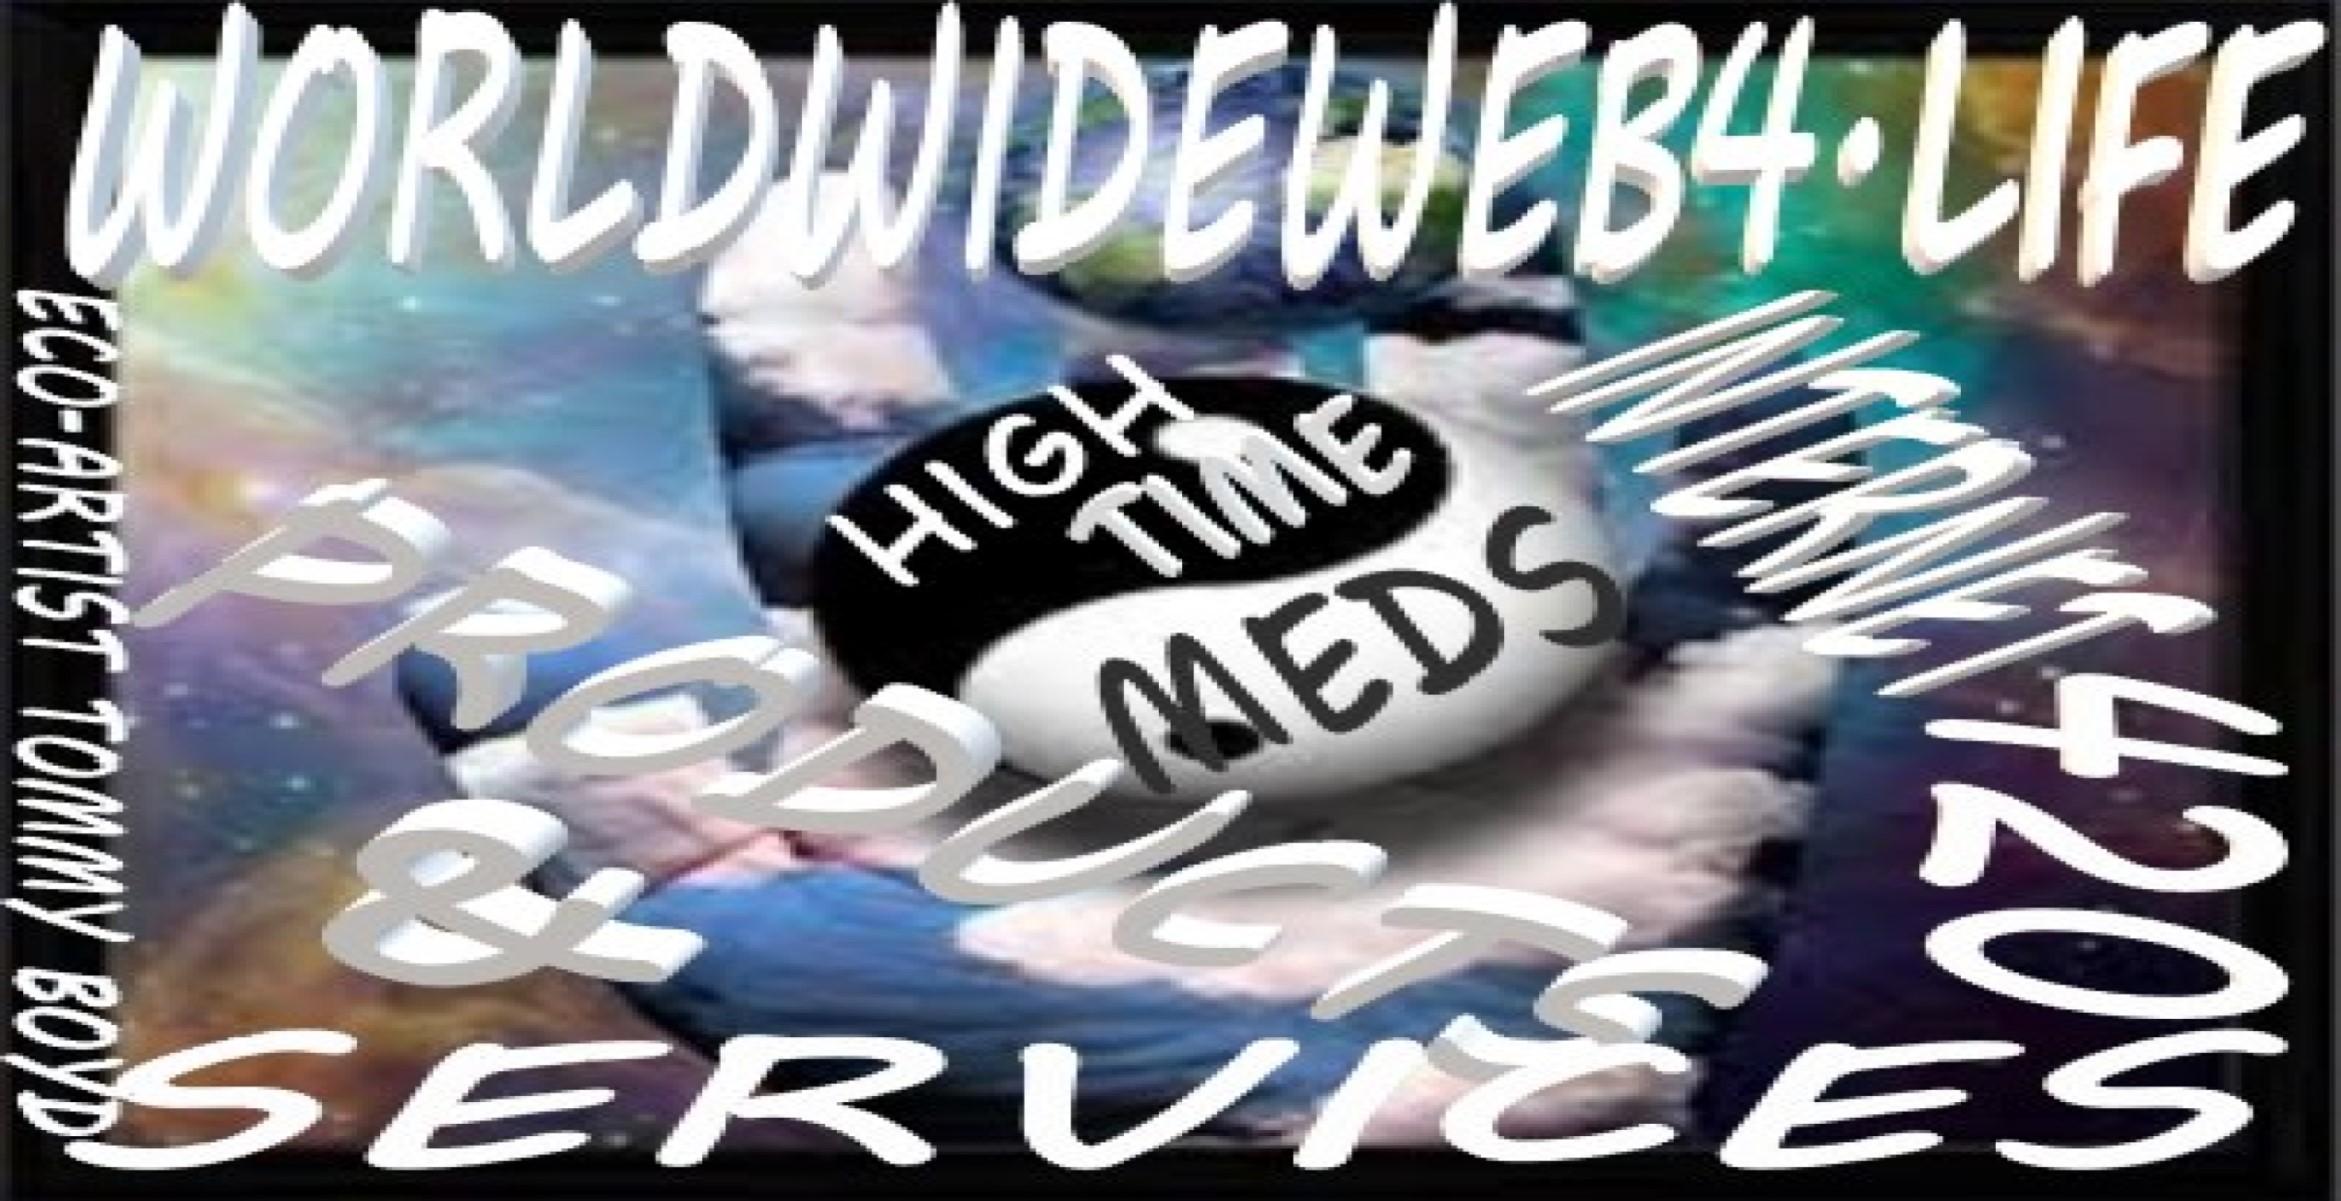 WORLD WIDE WEB 4 LIFE